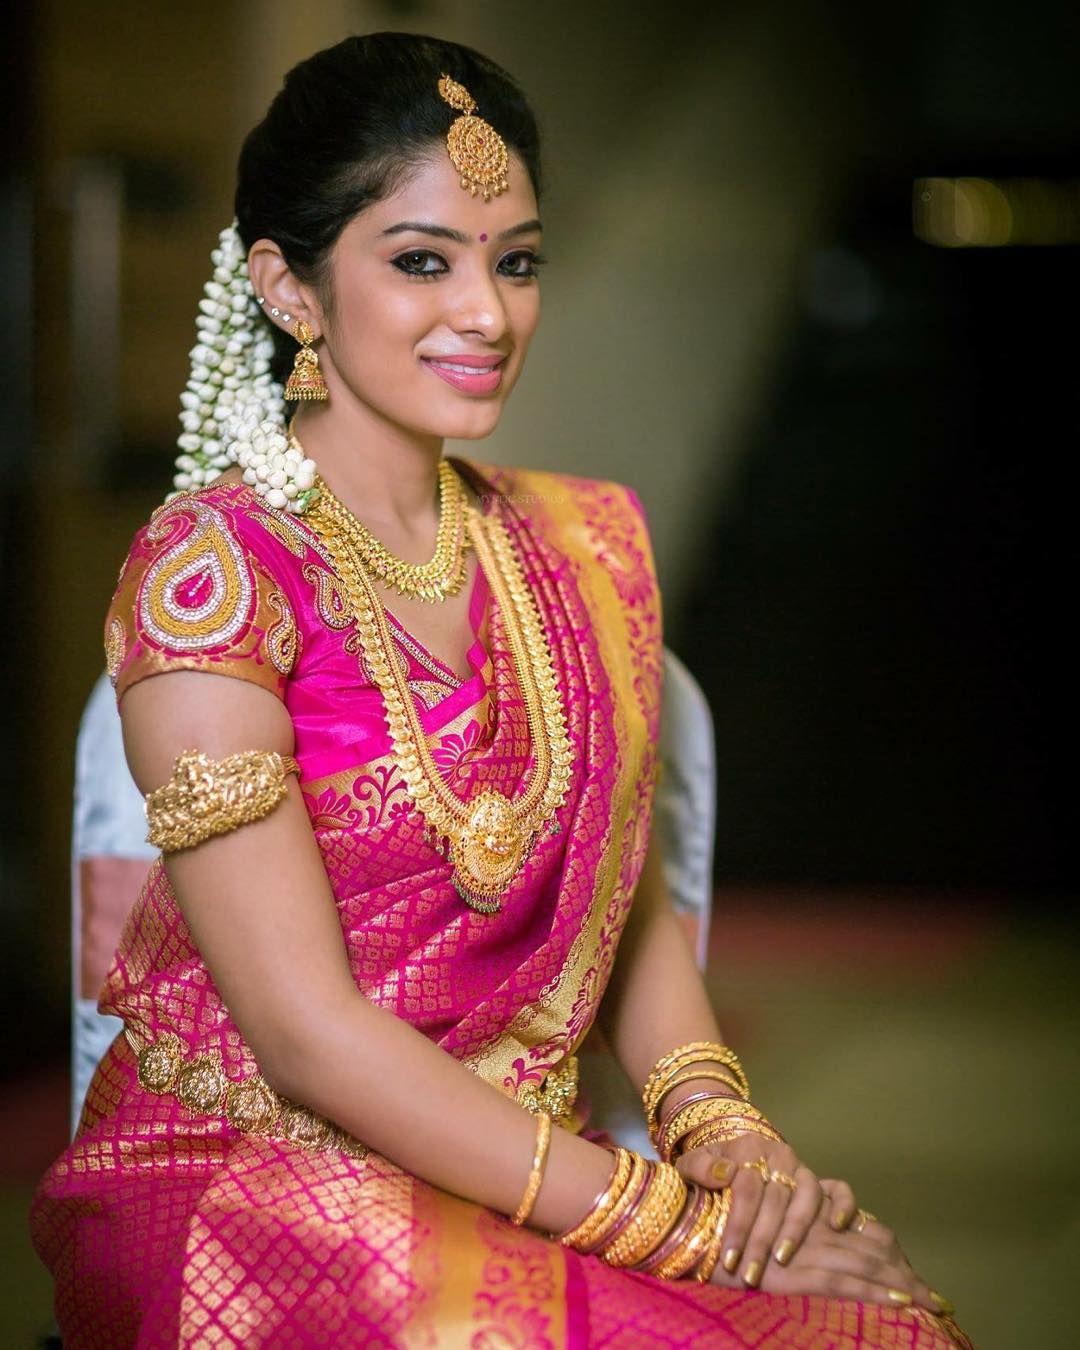 Kerala Wedding Hairstyles For Big Face: Every Bride's Favourite Saree Colour! PC: @mysticstudios